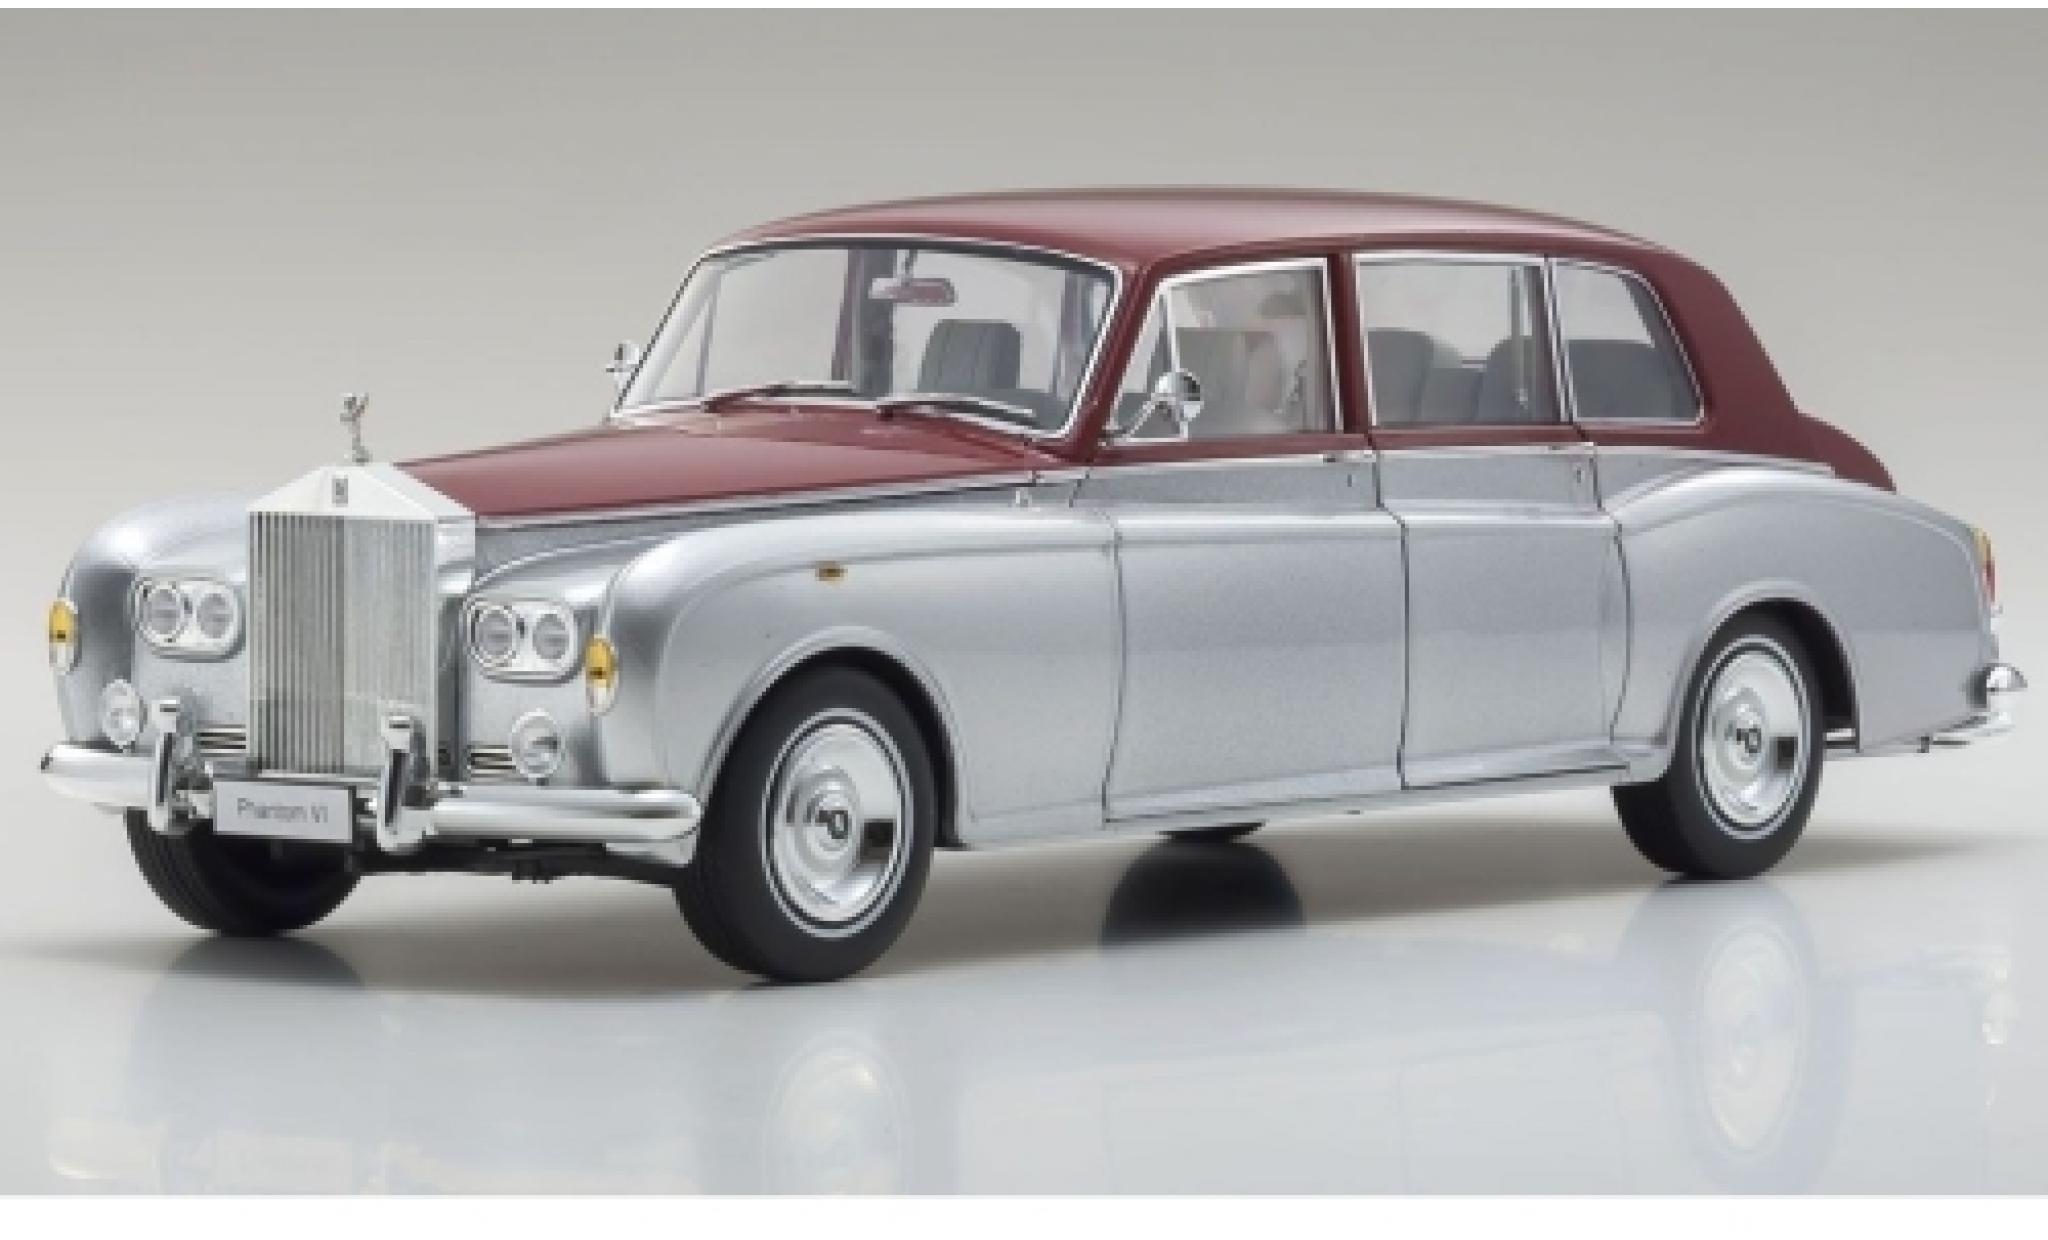 Rolls Royce Phantom 1/18 Kyosho VI grise/rouge RHD